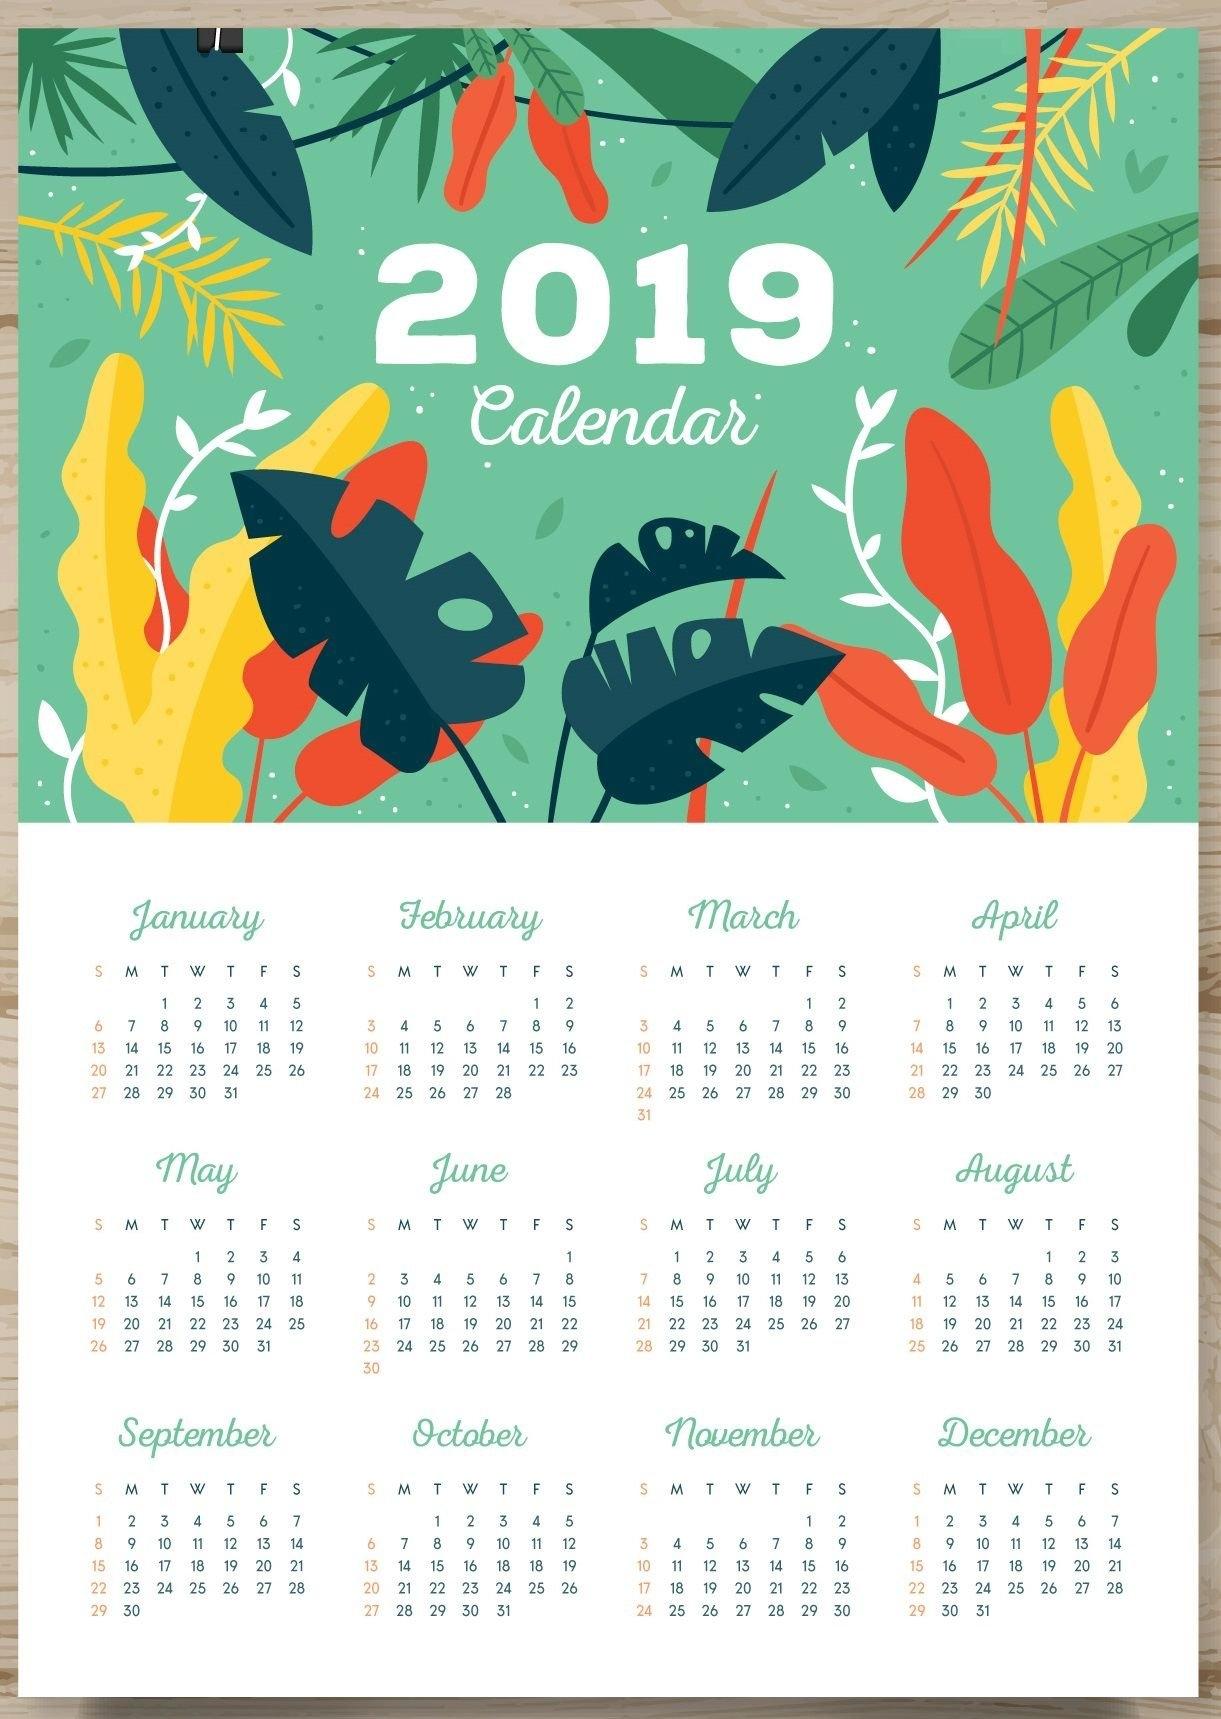 One Page Calendar 2019 | Monthly Calendar Templates | Calendar, 2019 Calendar 2019 1 Page